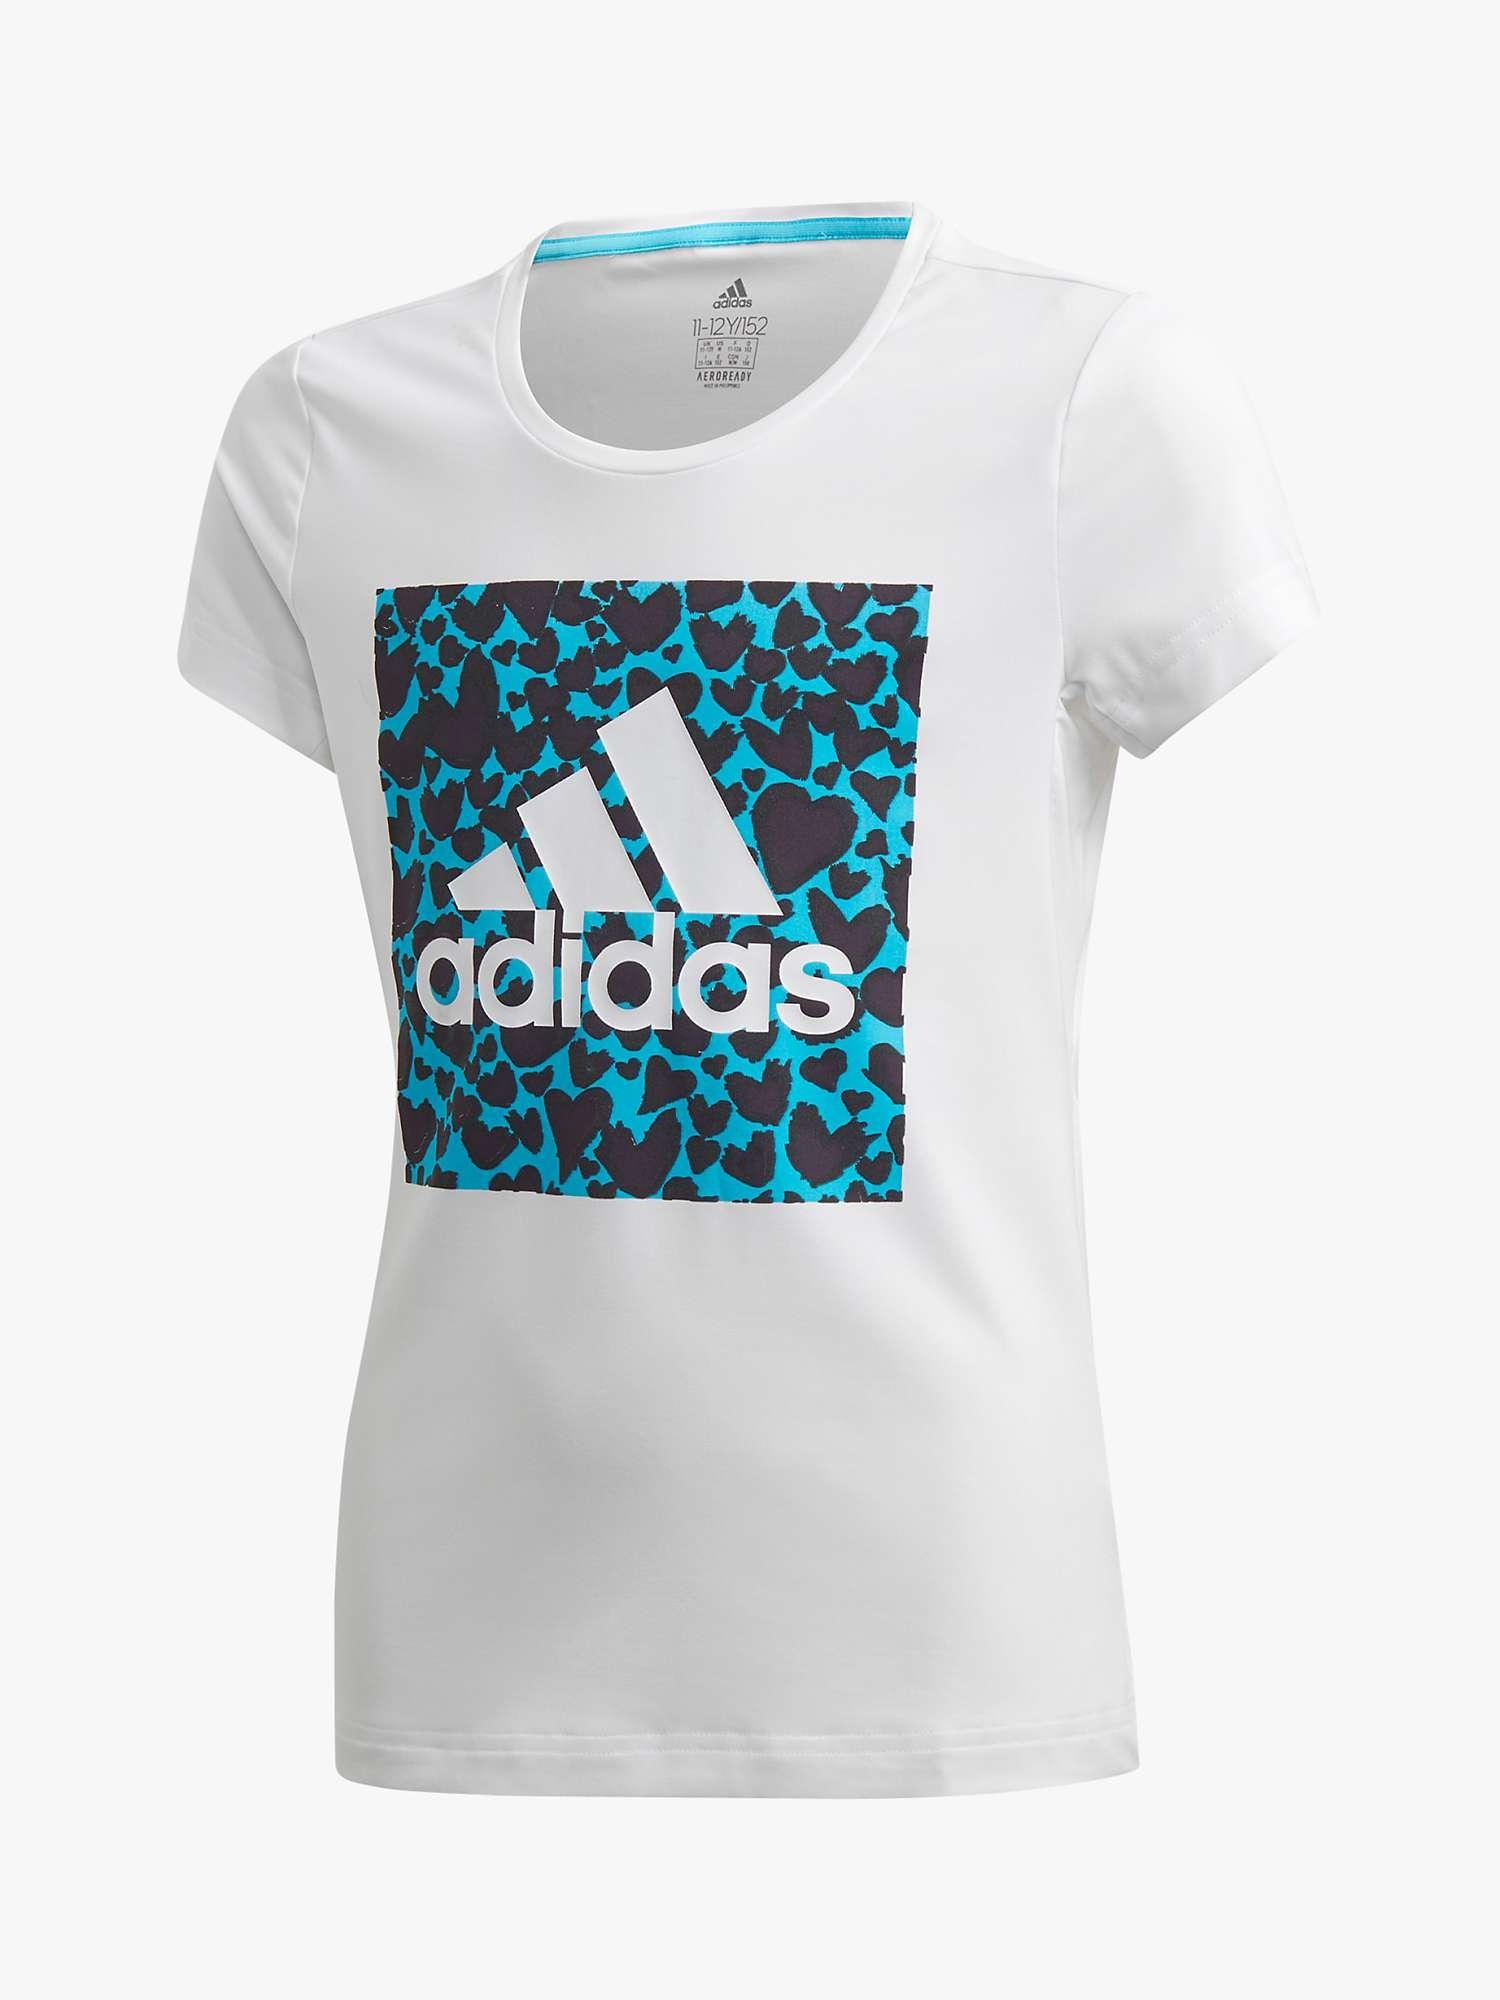 Burlas lucha Illinois  adidas Girls' Heart Logo T-Shirt, White at John Lewis & Partners